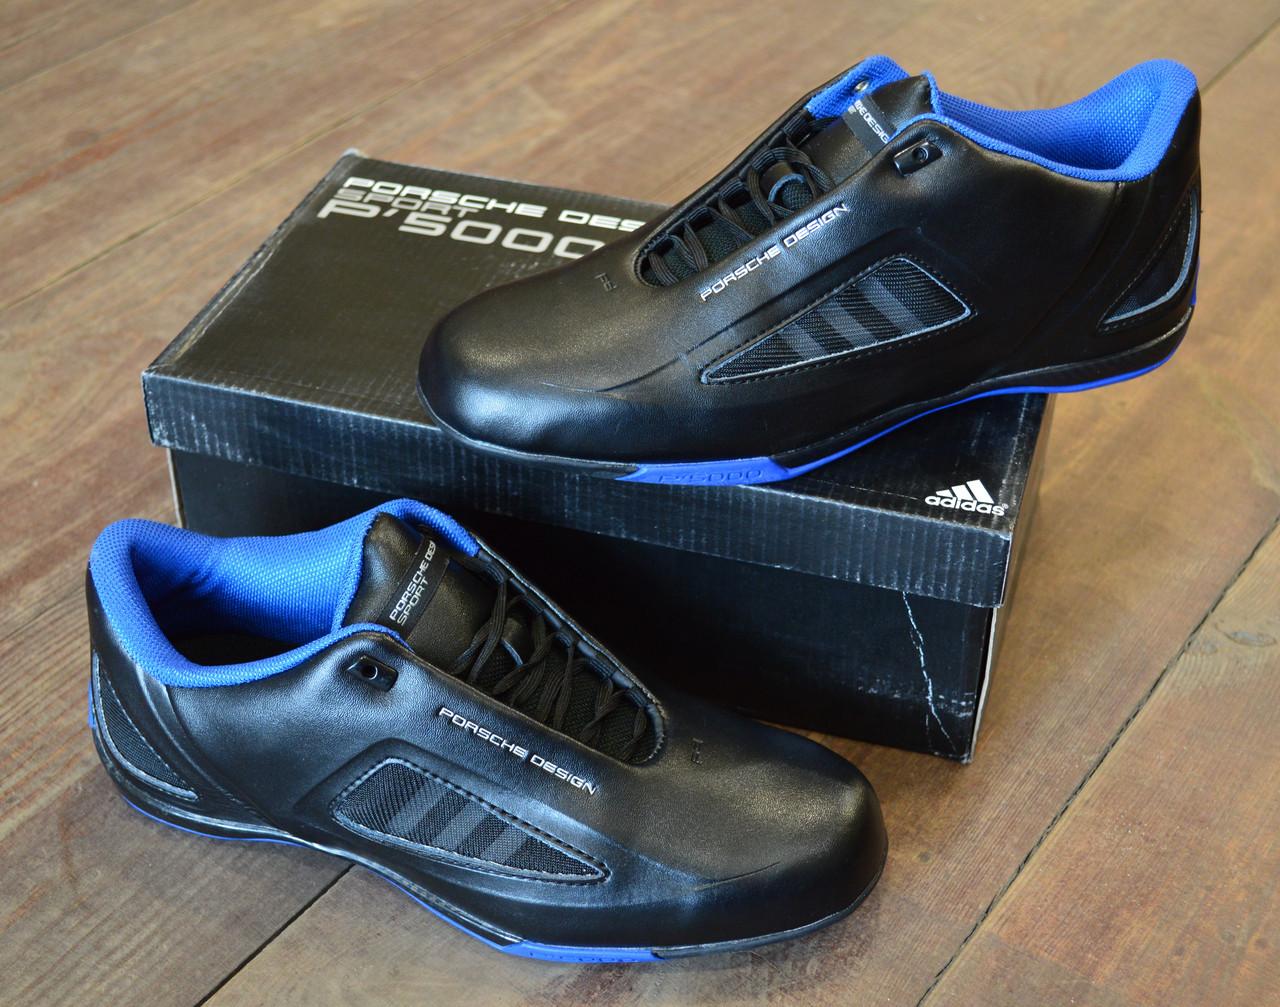 4d2287b6 ... Черные мужские кроссовки Adidas Porsche Design Drive Athletic II Leather  Black Blue Trainers , фото 7 ...